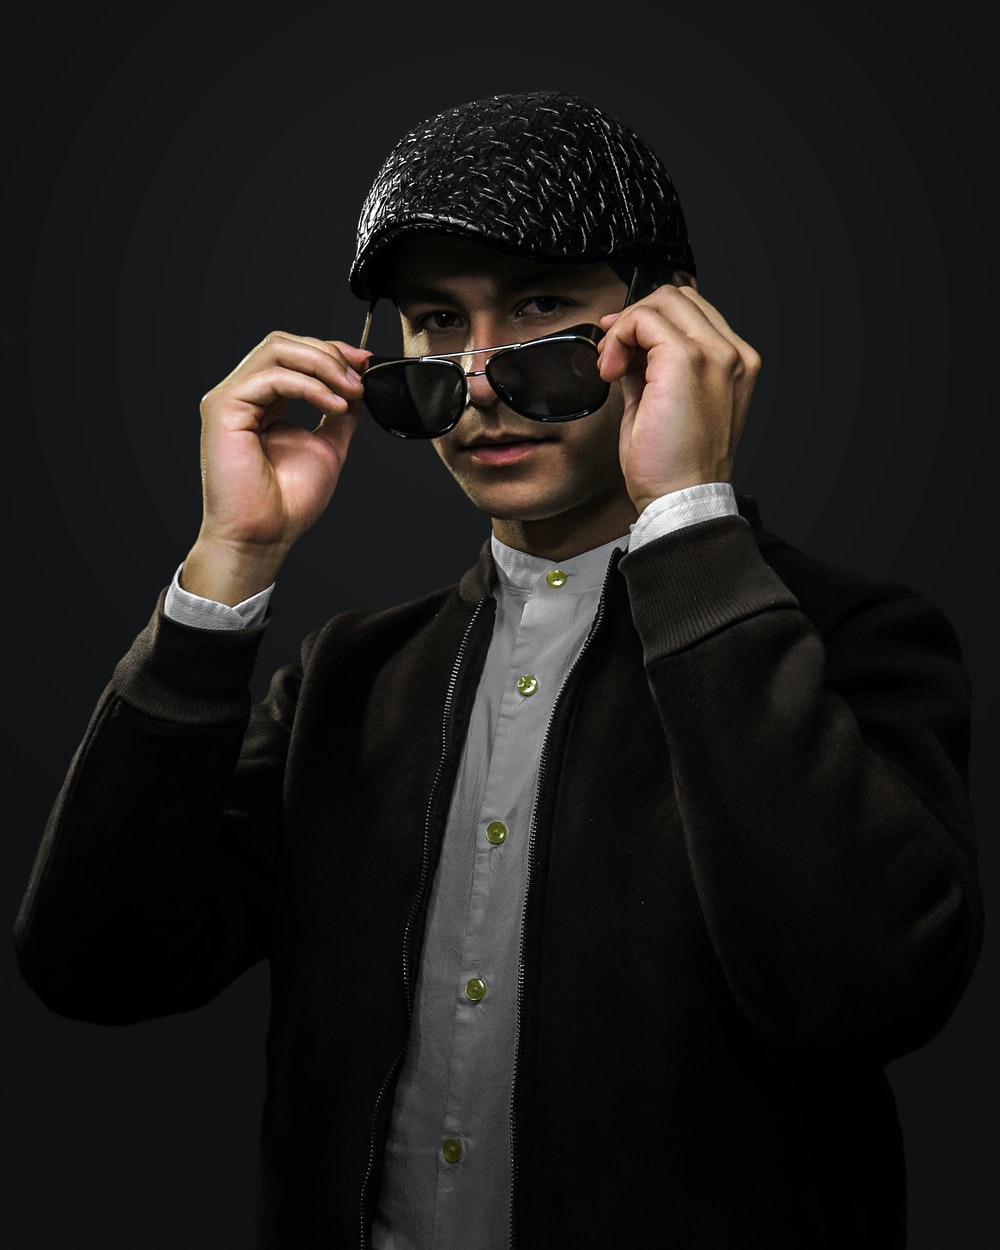 man in black coat wearing black knit cap and black sunglasses